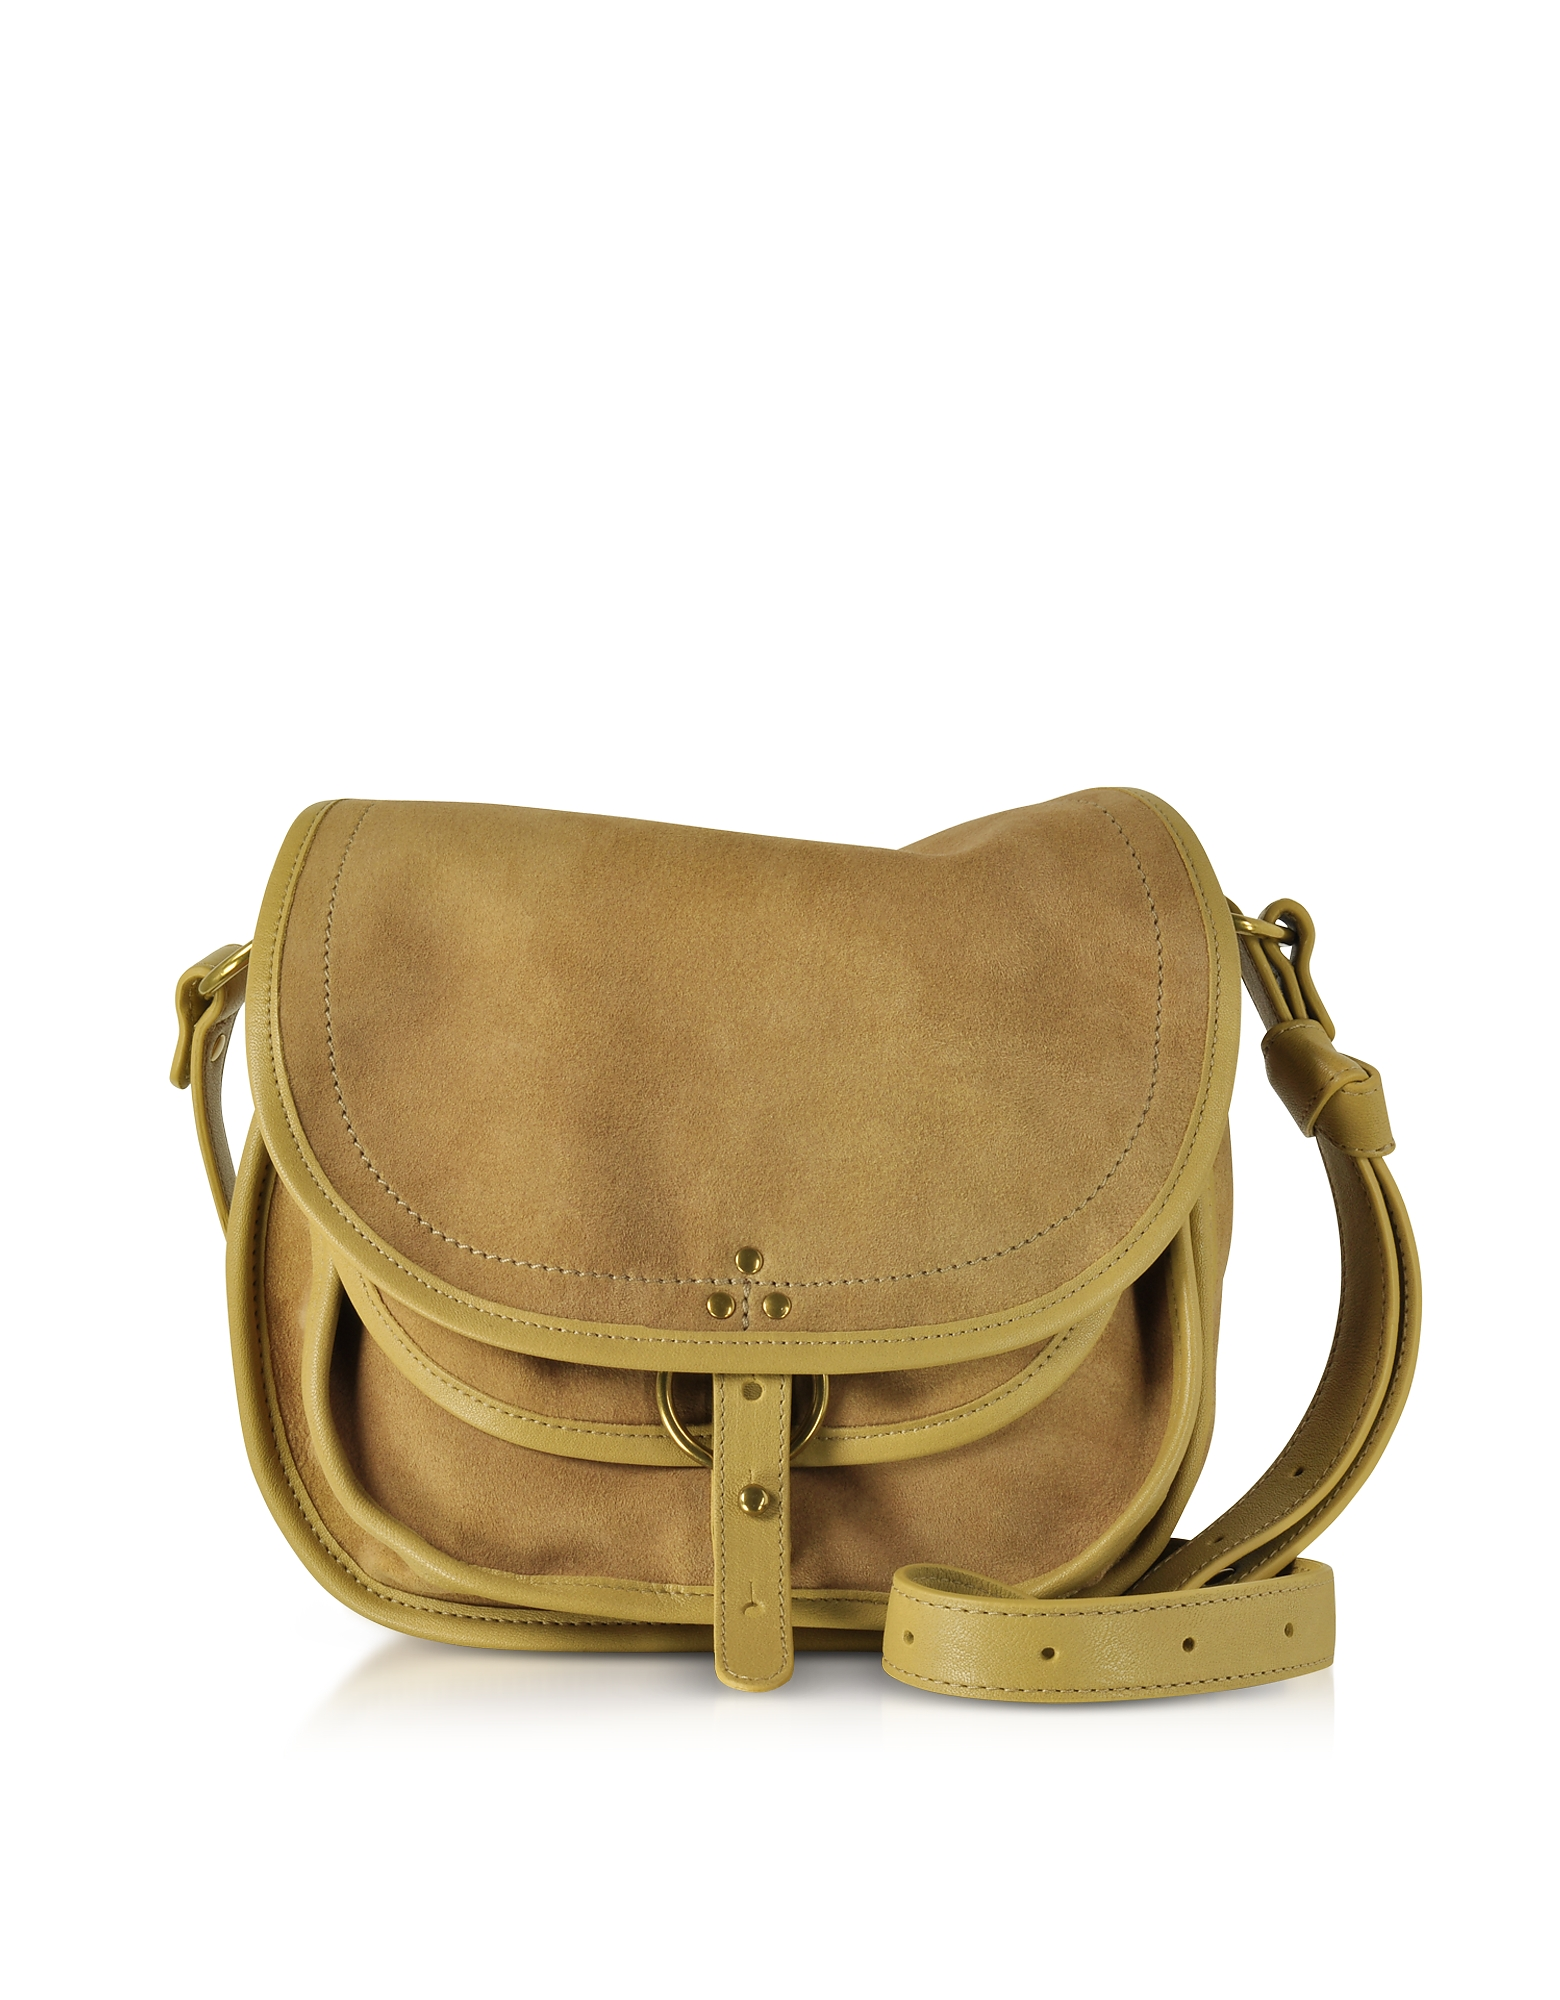 Jerome Dreyfuss Handbags, Felix Suede Shoulder Bag